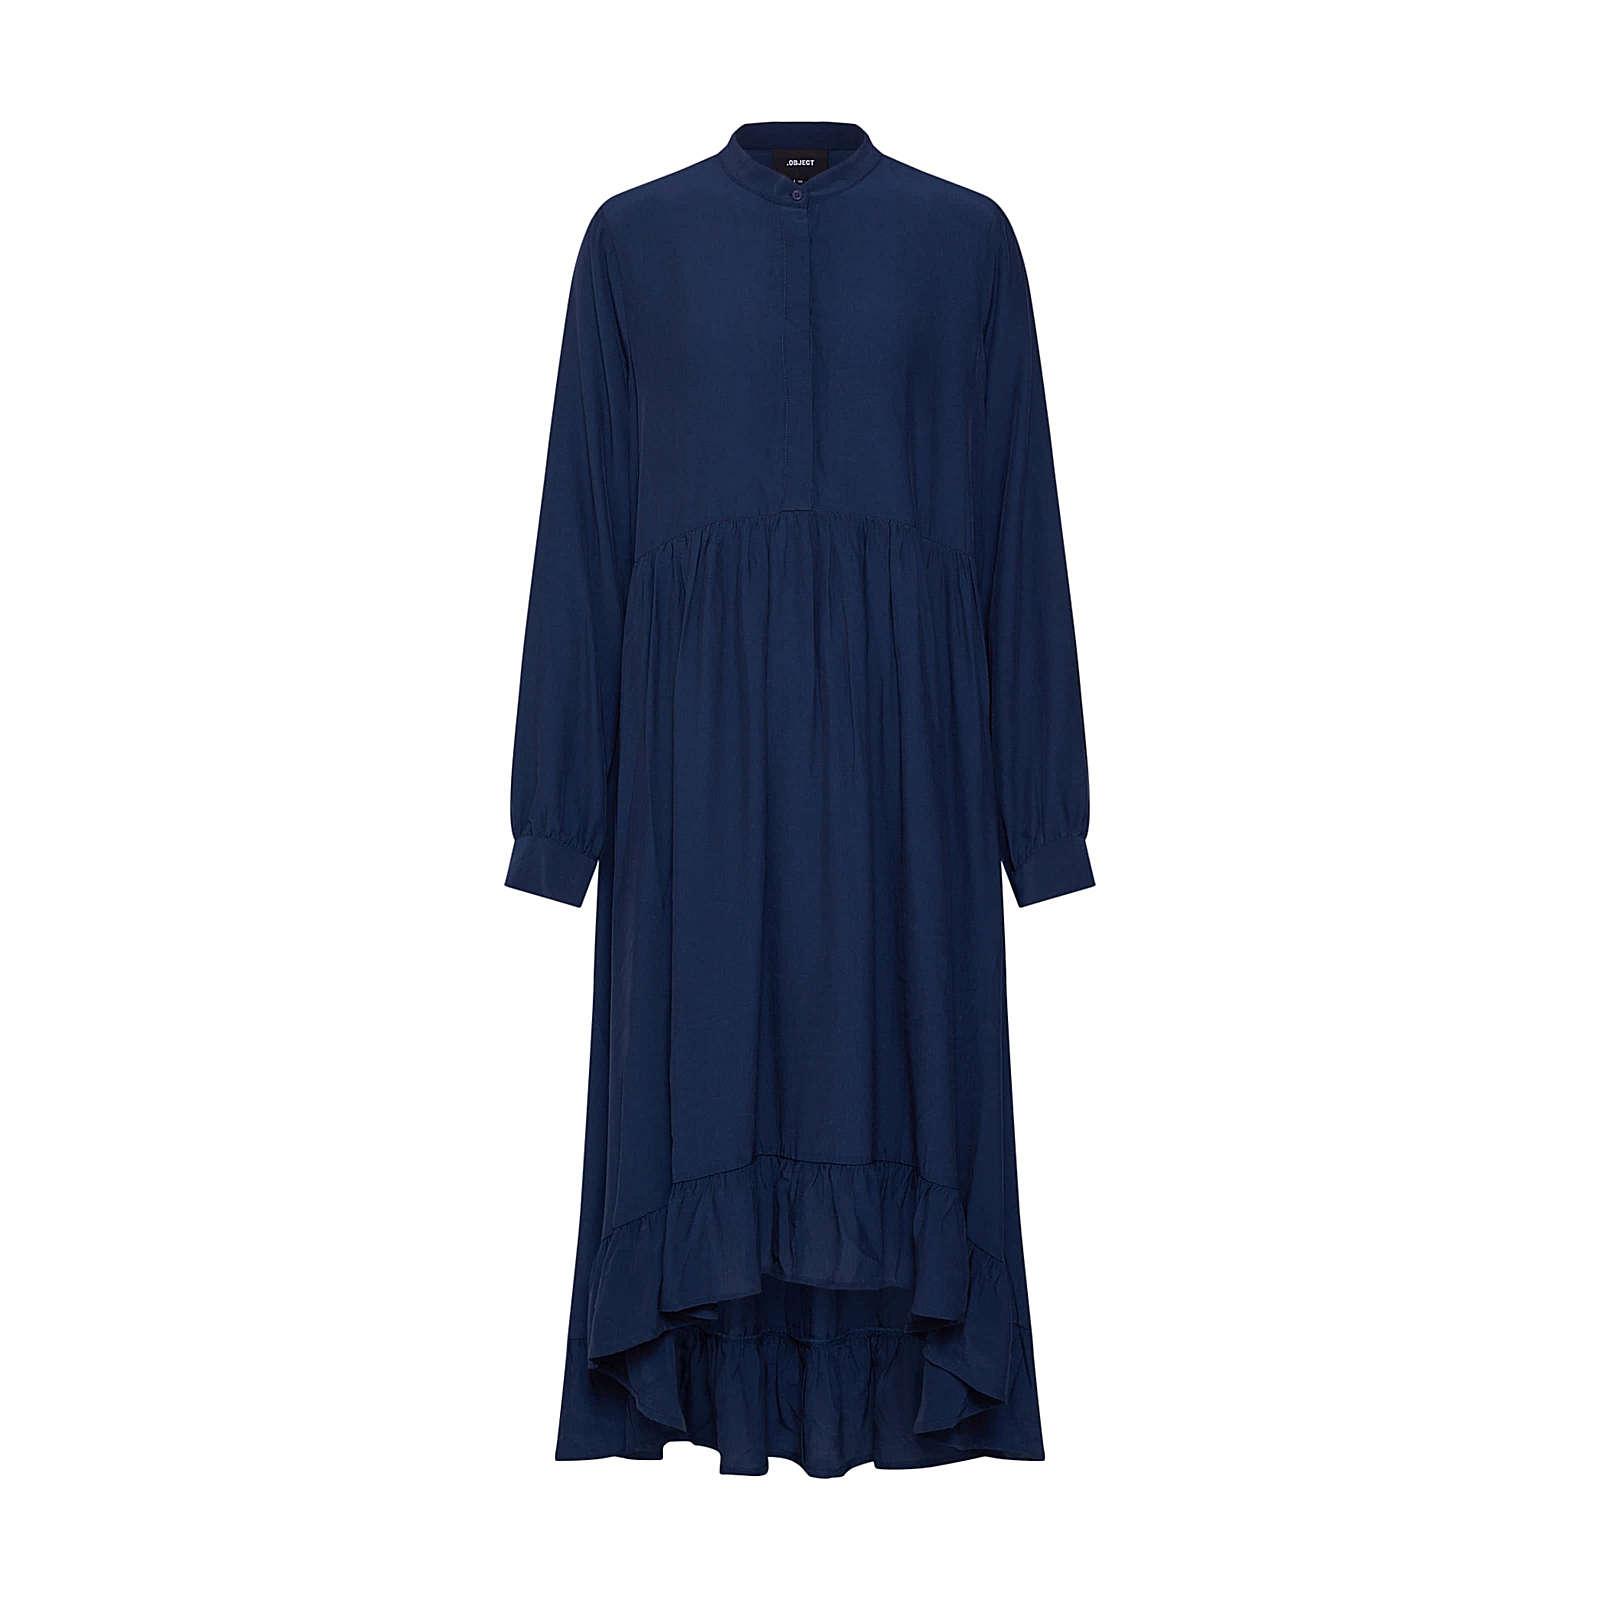 OBJECT Blusenkleid Blusenkleider blau Damen Gr. 40